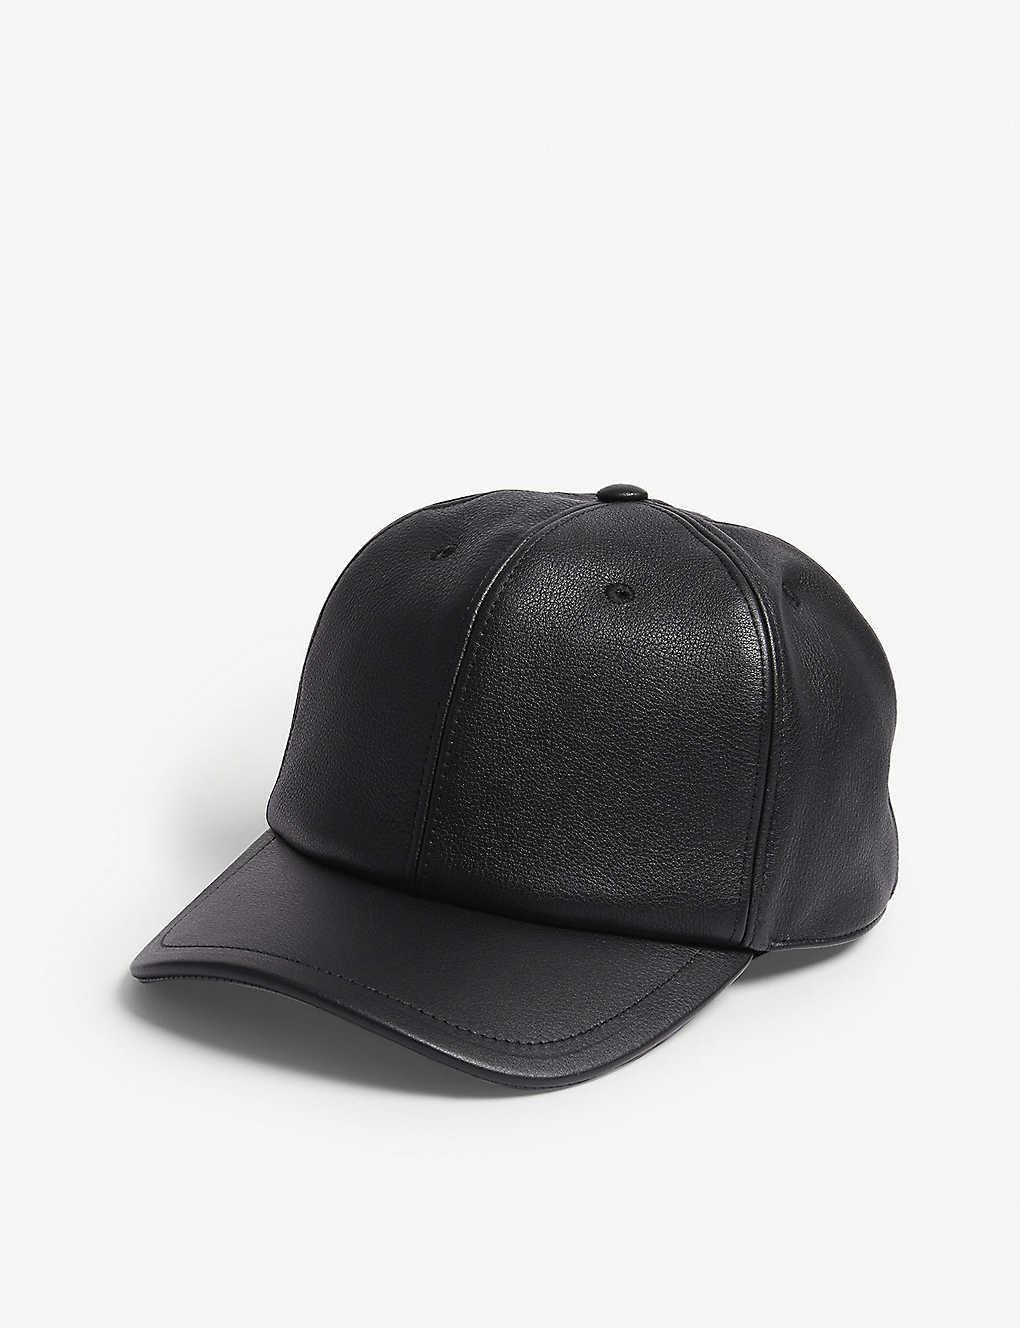 GIVENCHY - Address logo leather cap  df4b641f783